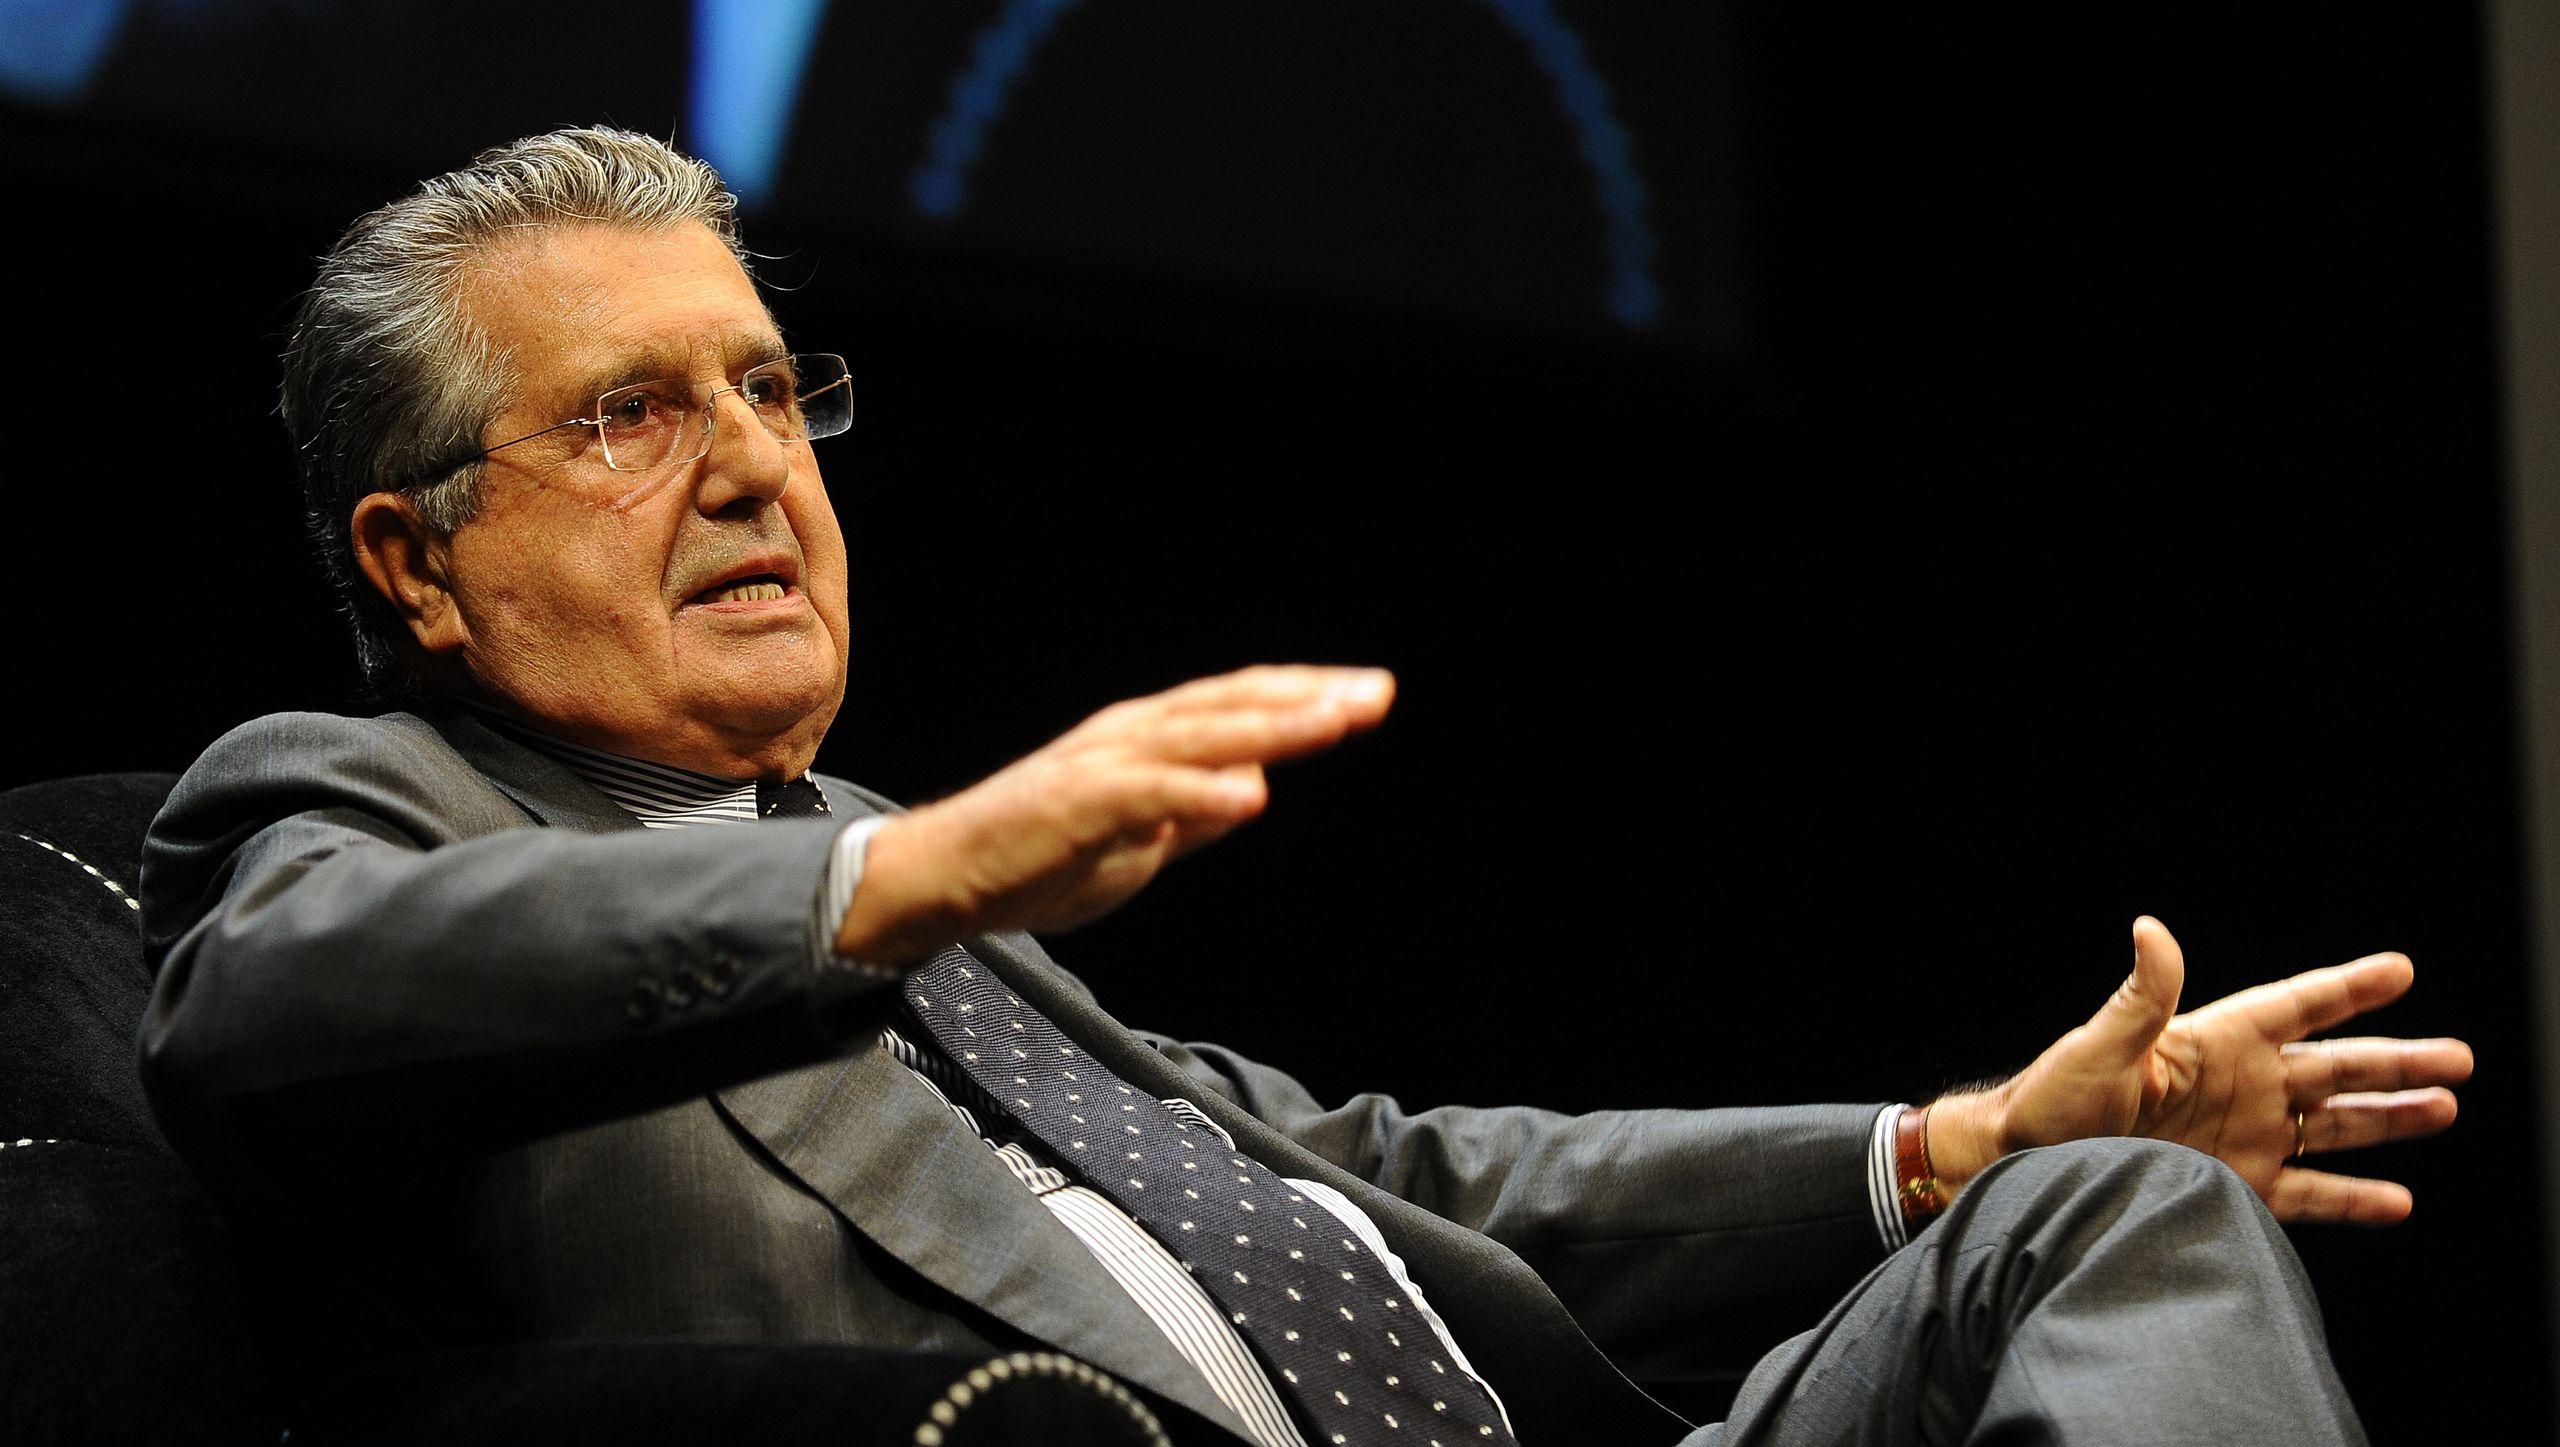 Feltri的明天,De Benedetti想要在報紙上贊達的民主抽搐